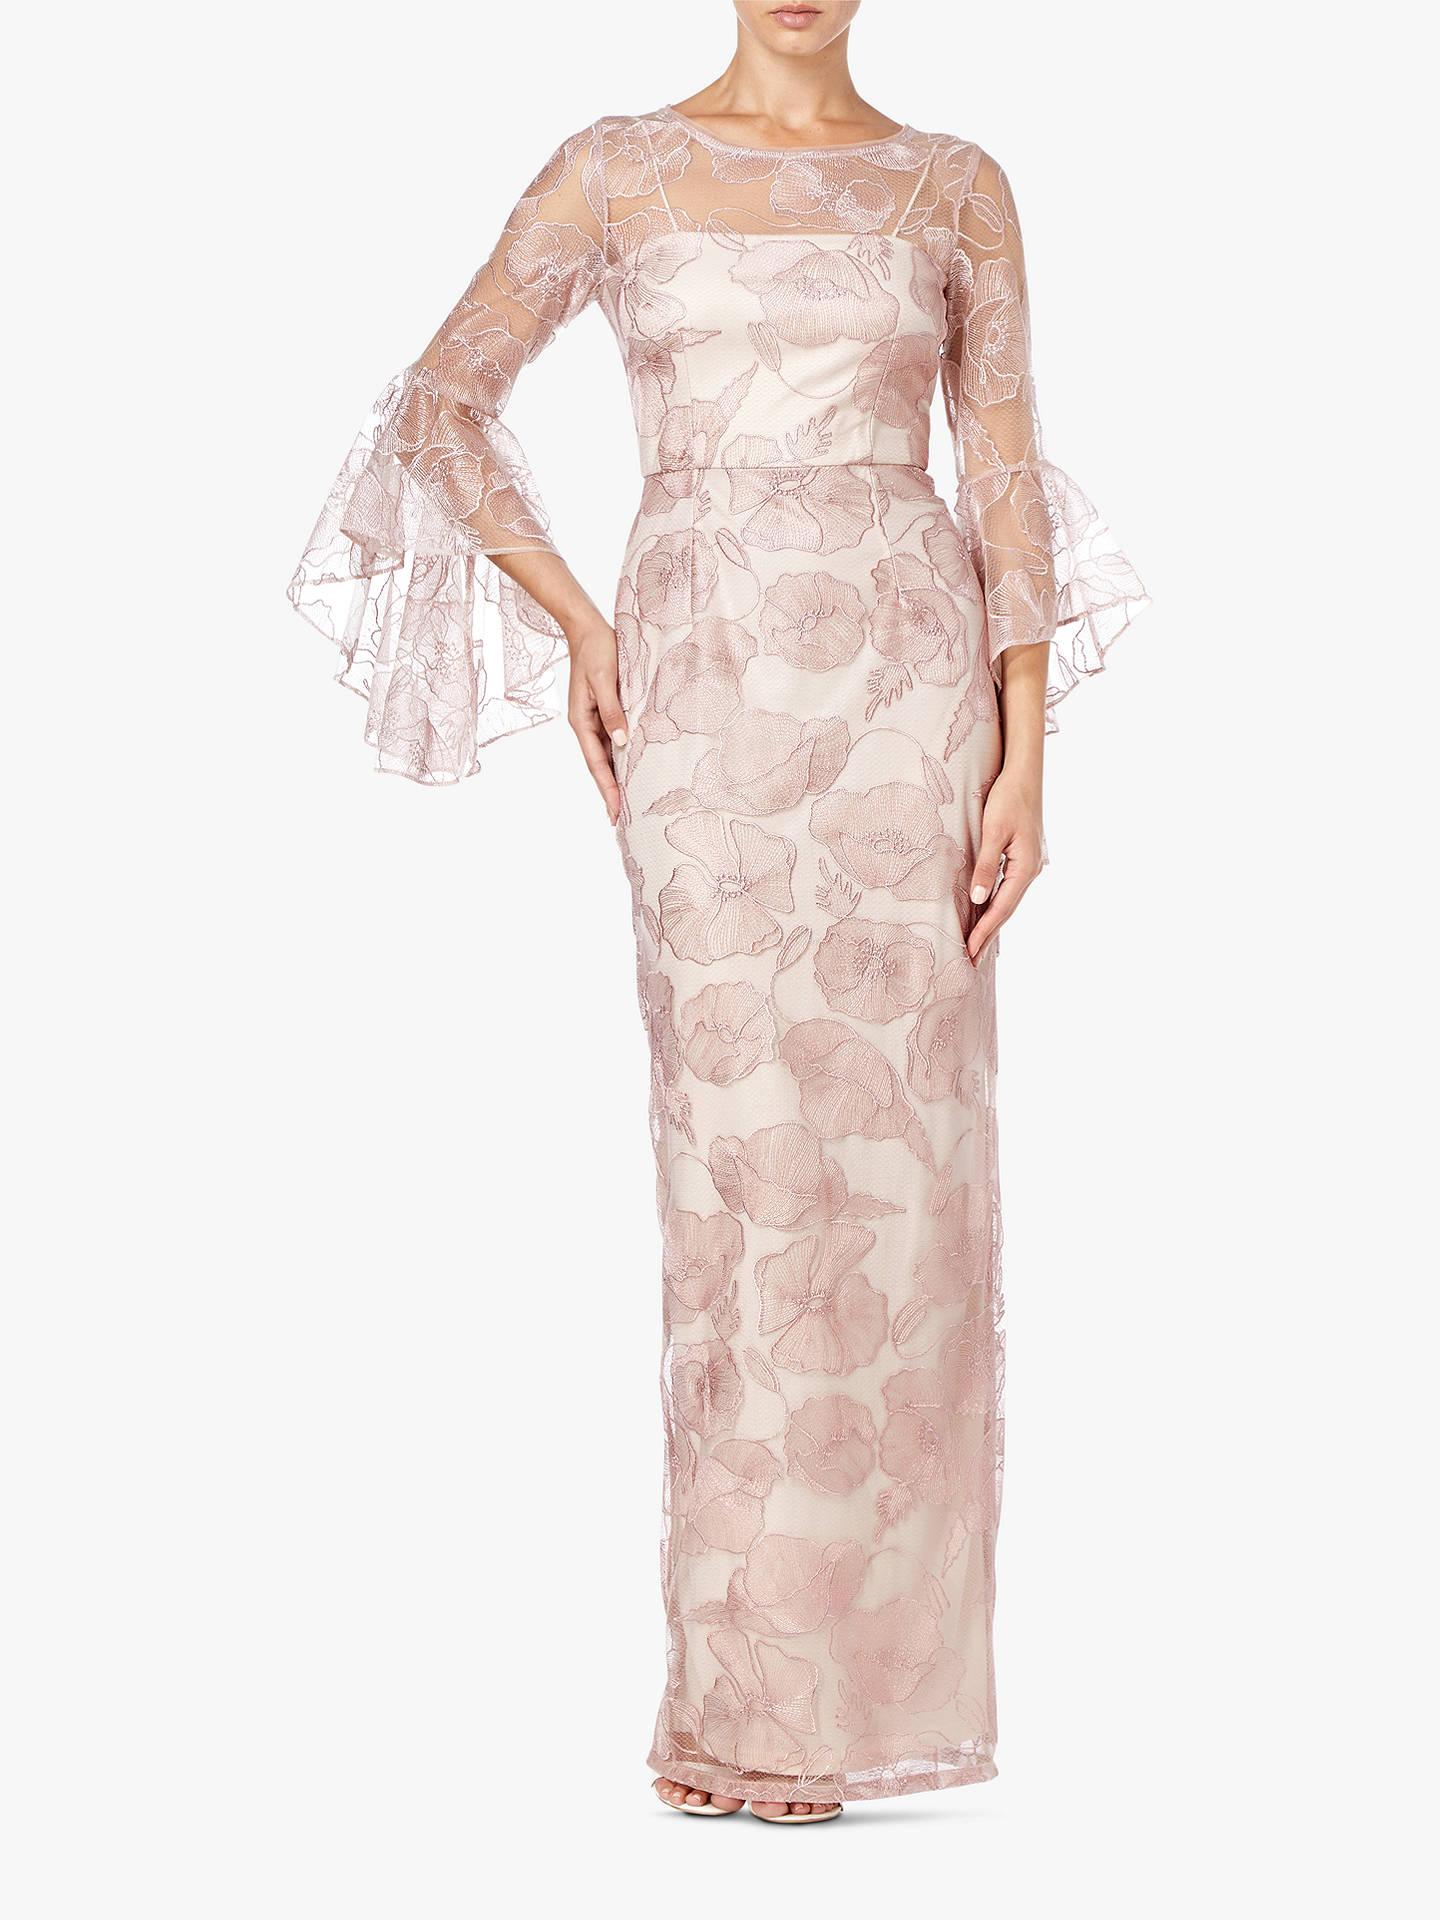 15e9648abc6f Adrianna Papell Embroidered Floral Maxi Dress, Quartz at John Lewis ...